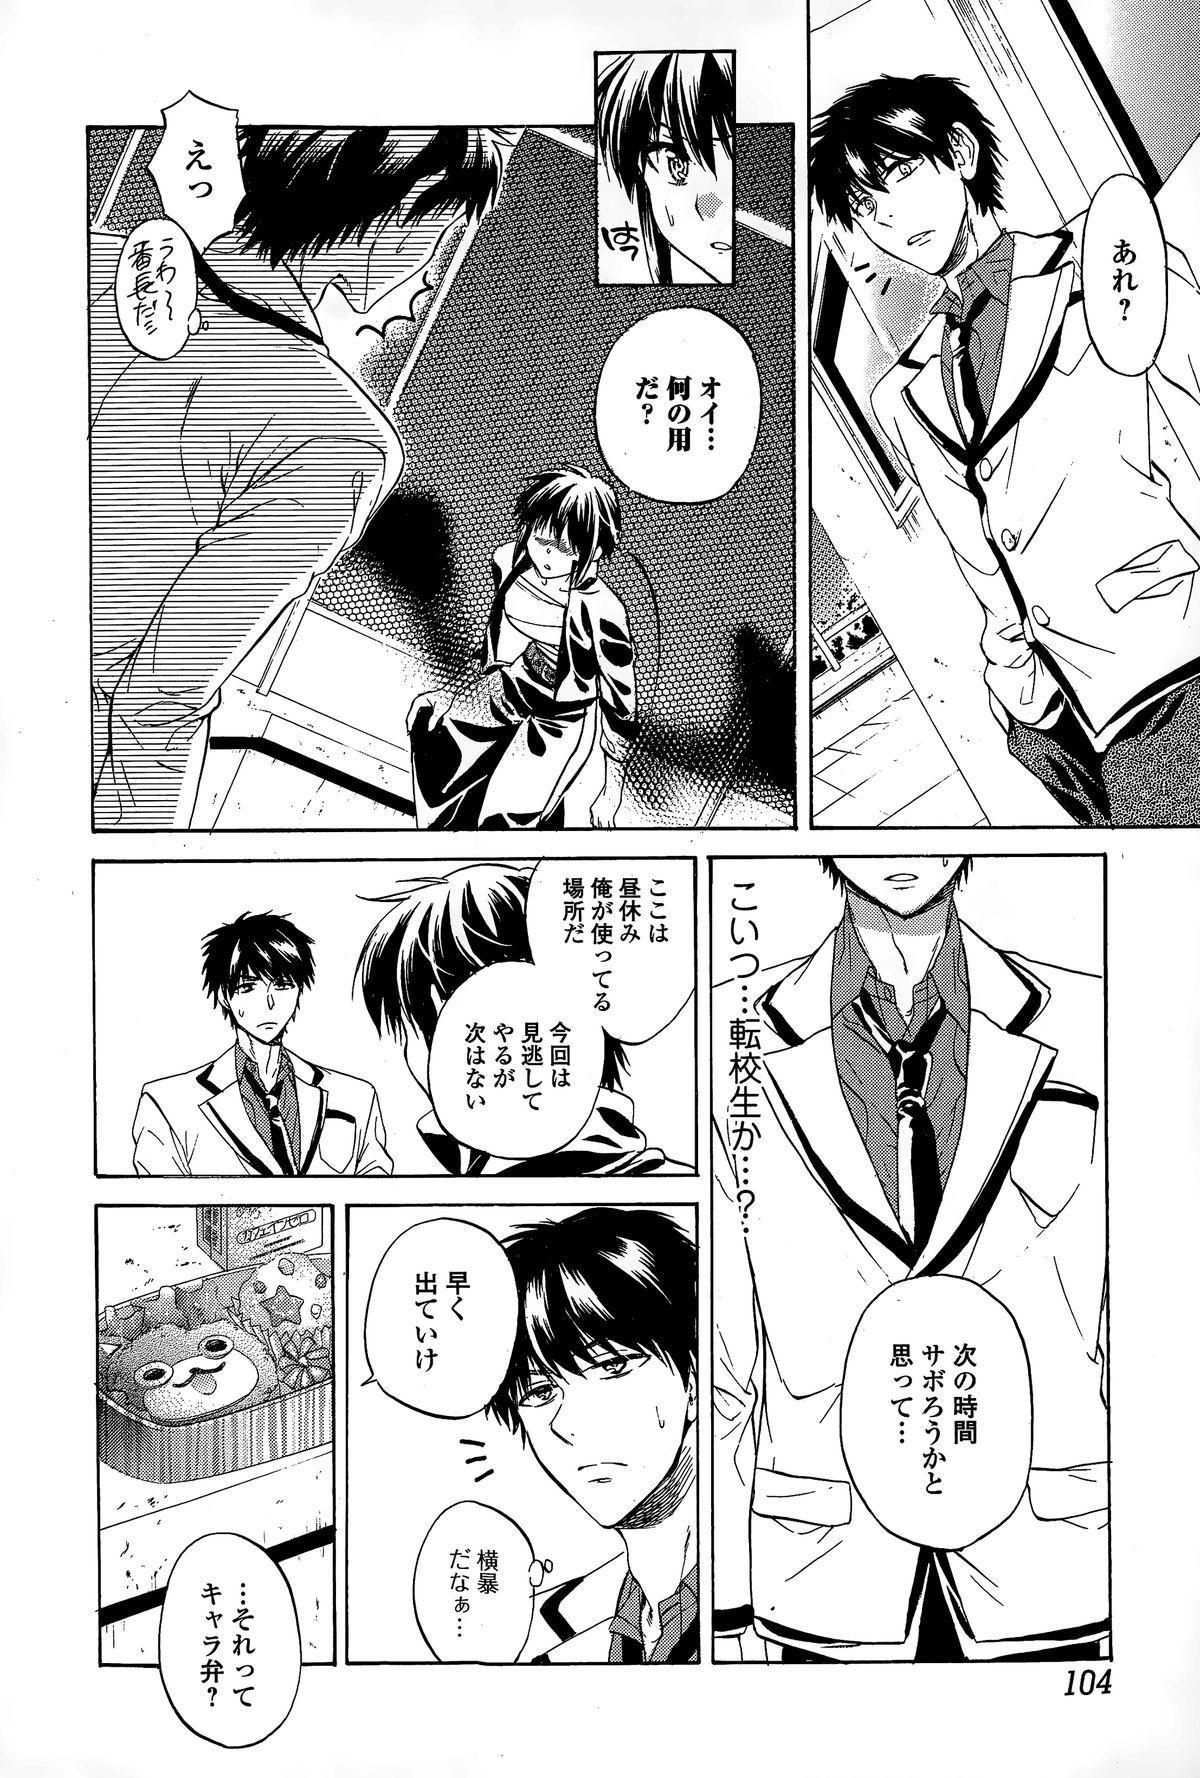 Comic Toutetsu 2015-02 Vol. 3 103